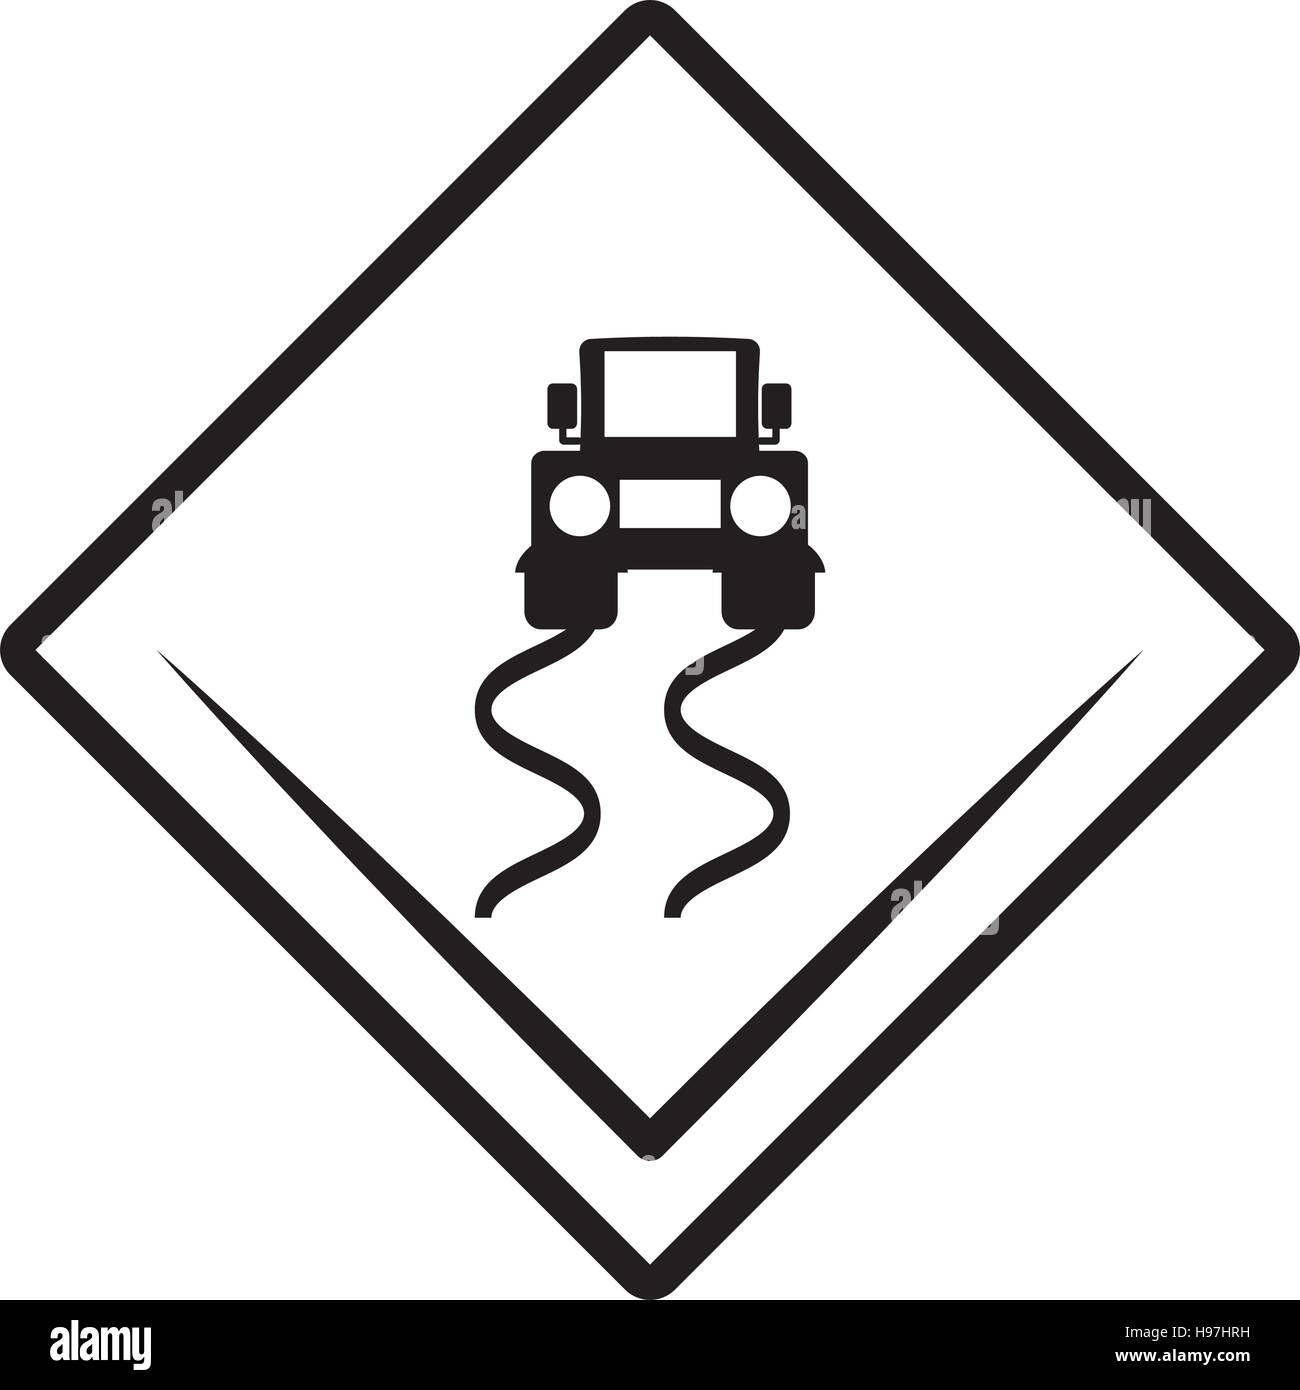 slippery road traffic signal - Stock Image